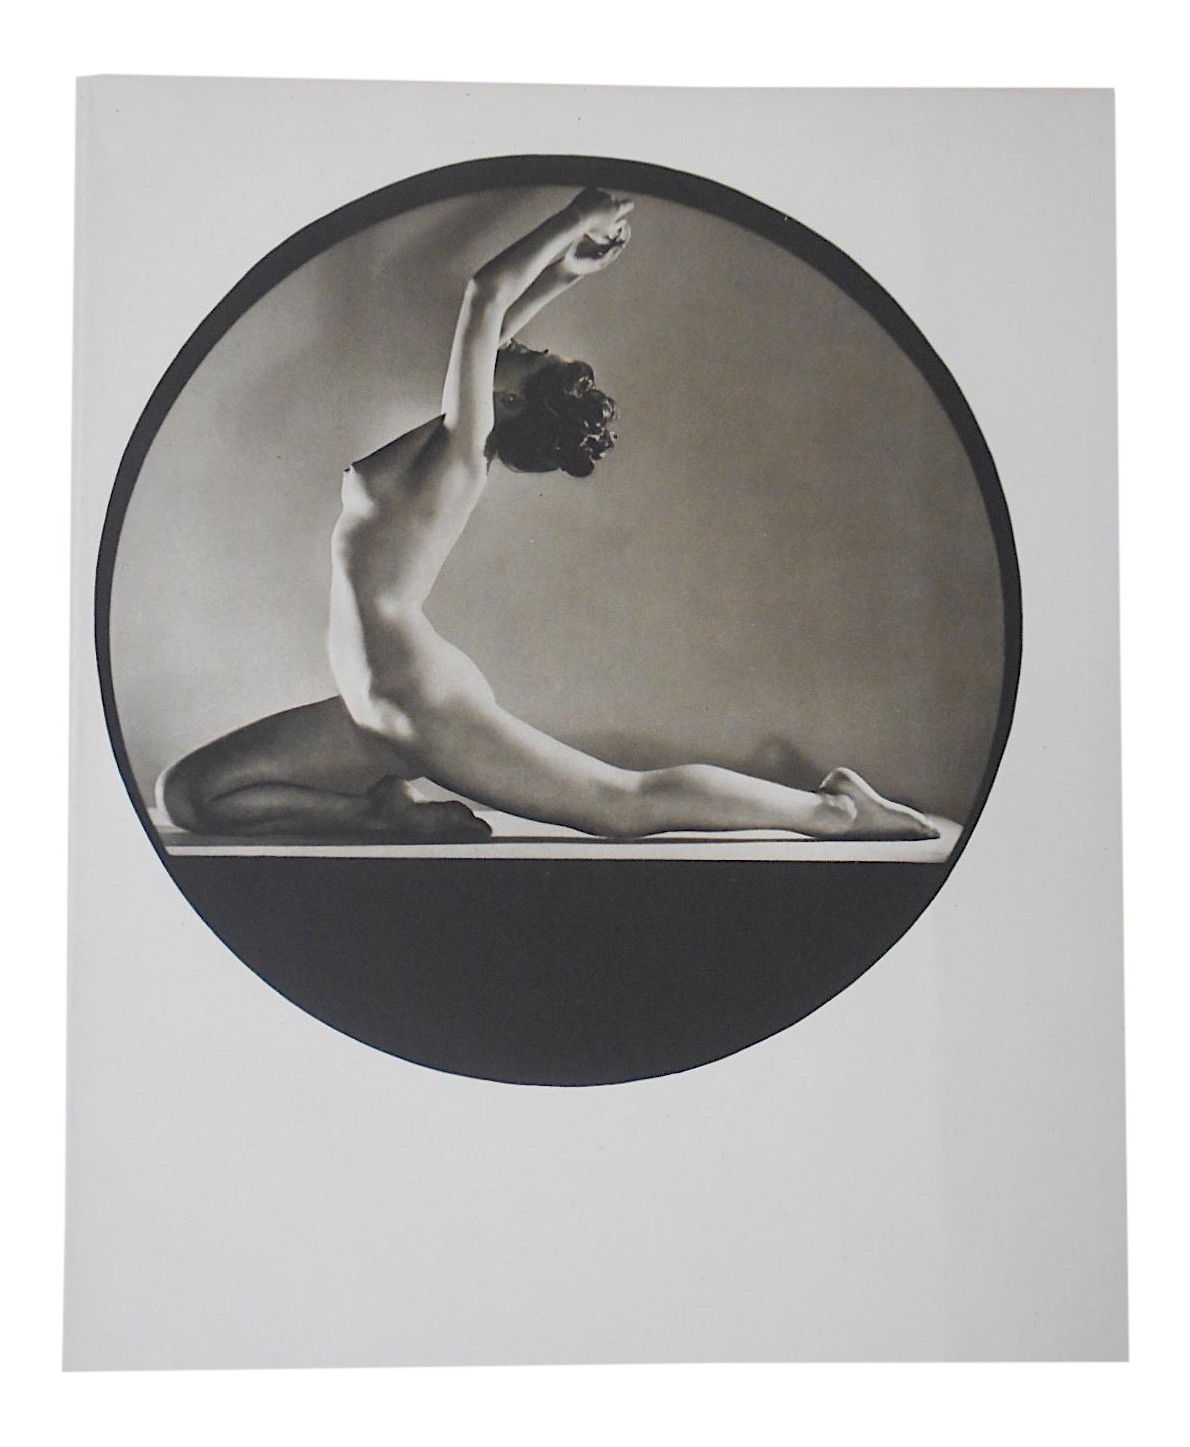 Vintage 1981 nude art graphite print drawing by john c